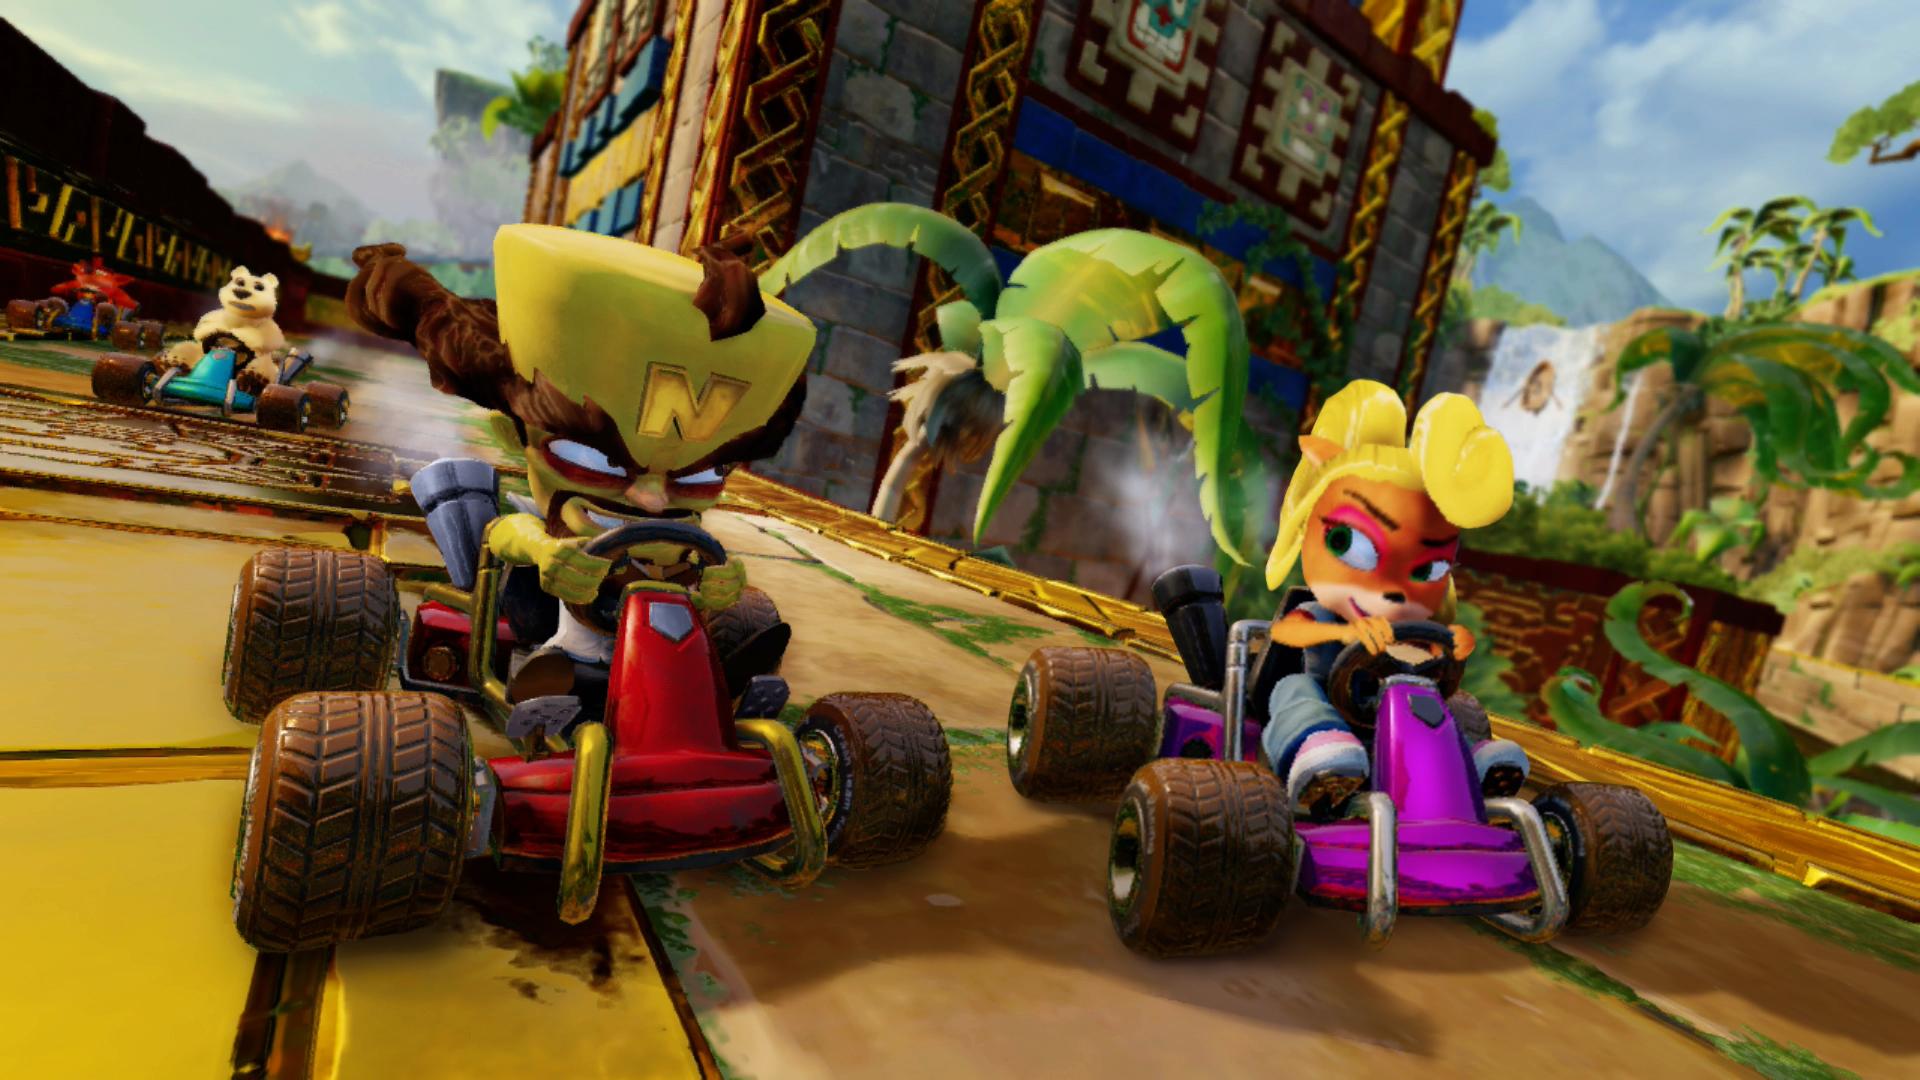 古惑狼赛车 重制版(Crash Team Racing Nitro-Fueled)插图2